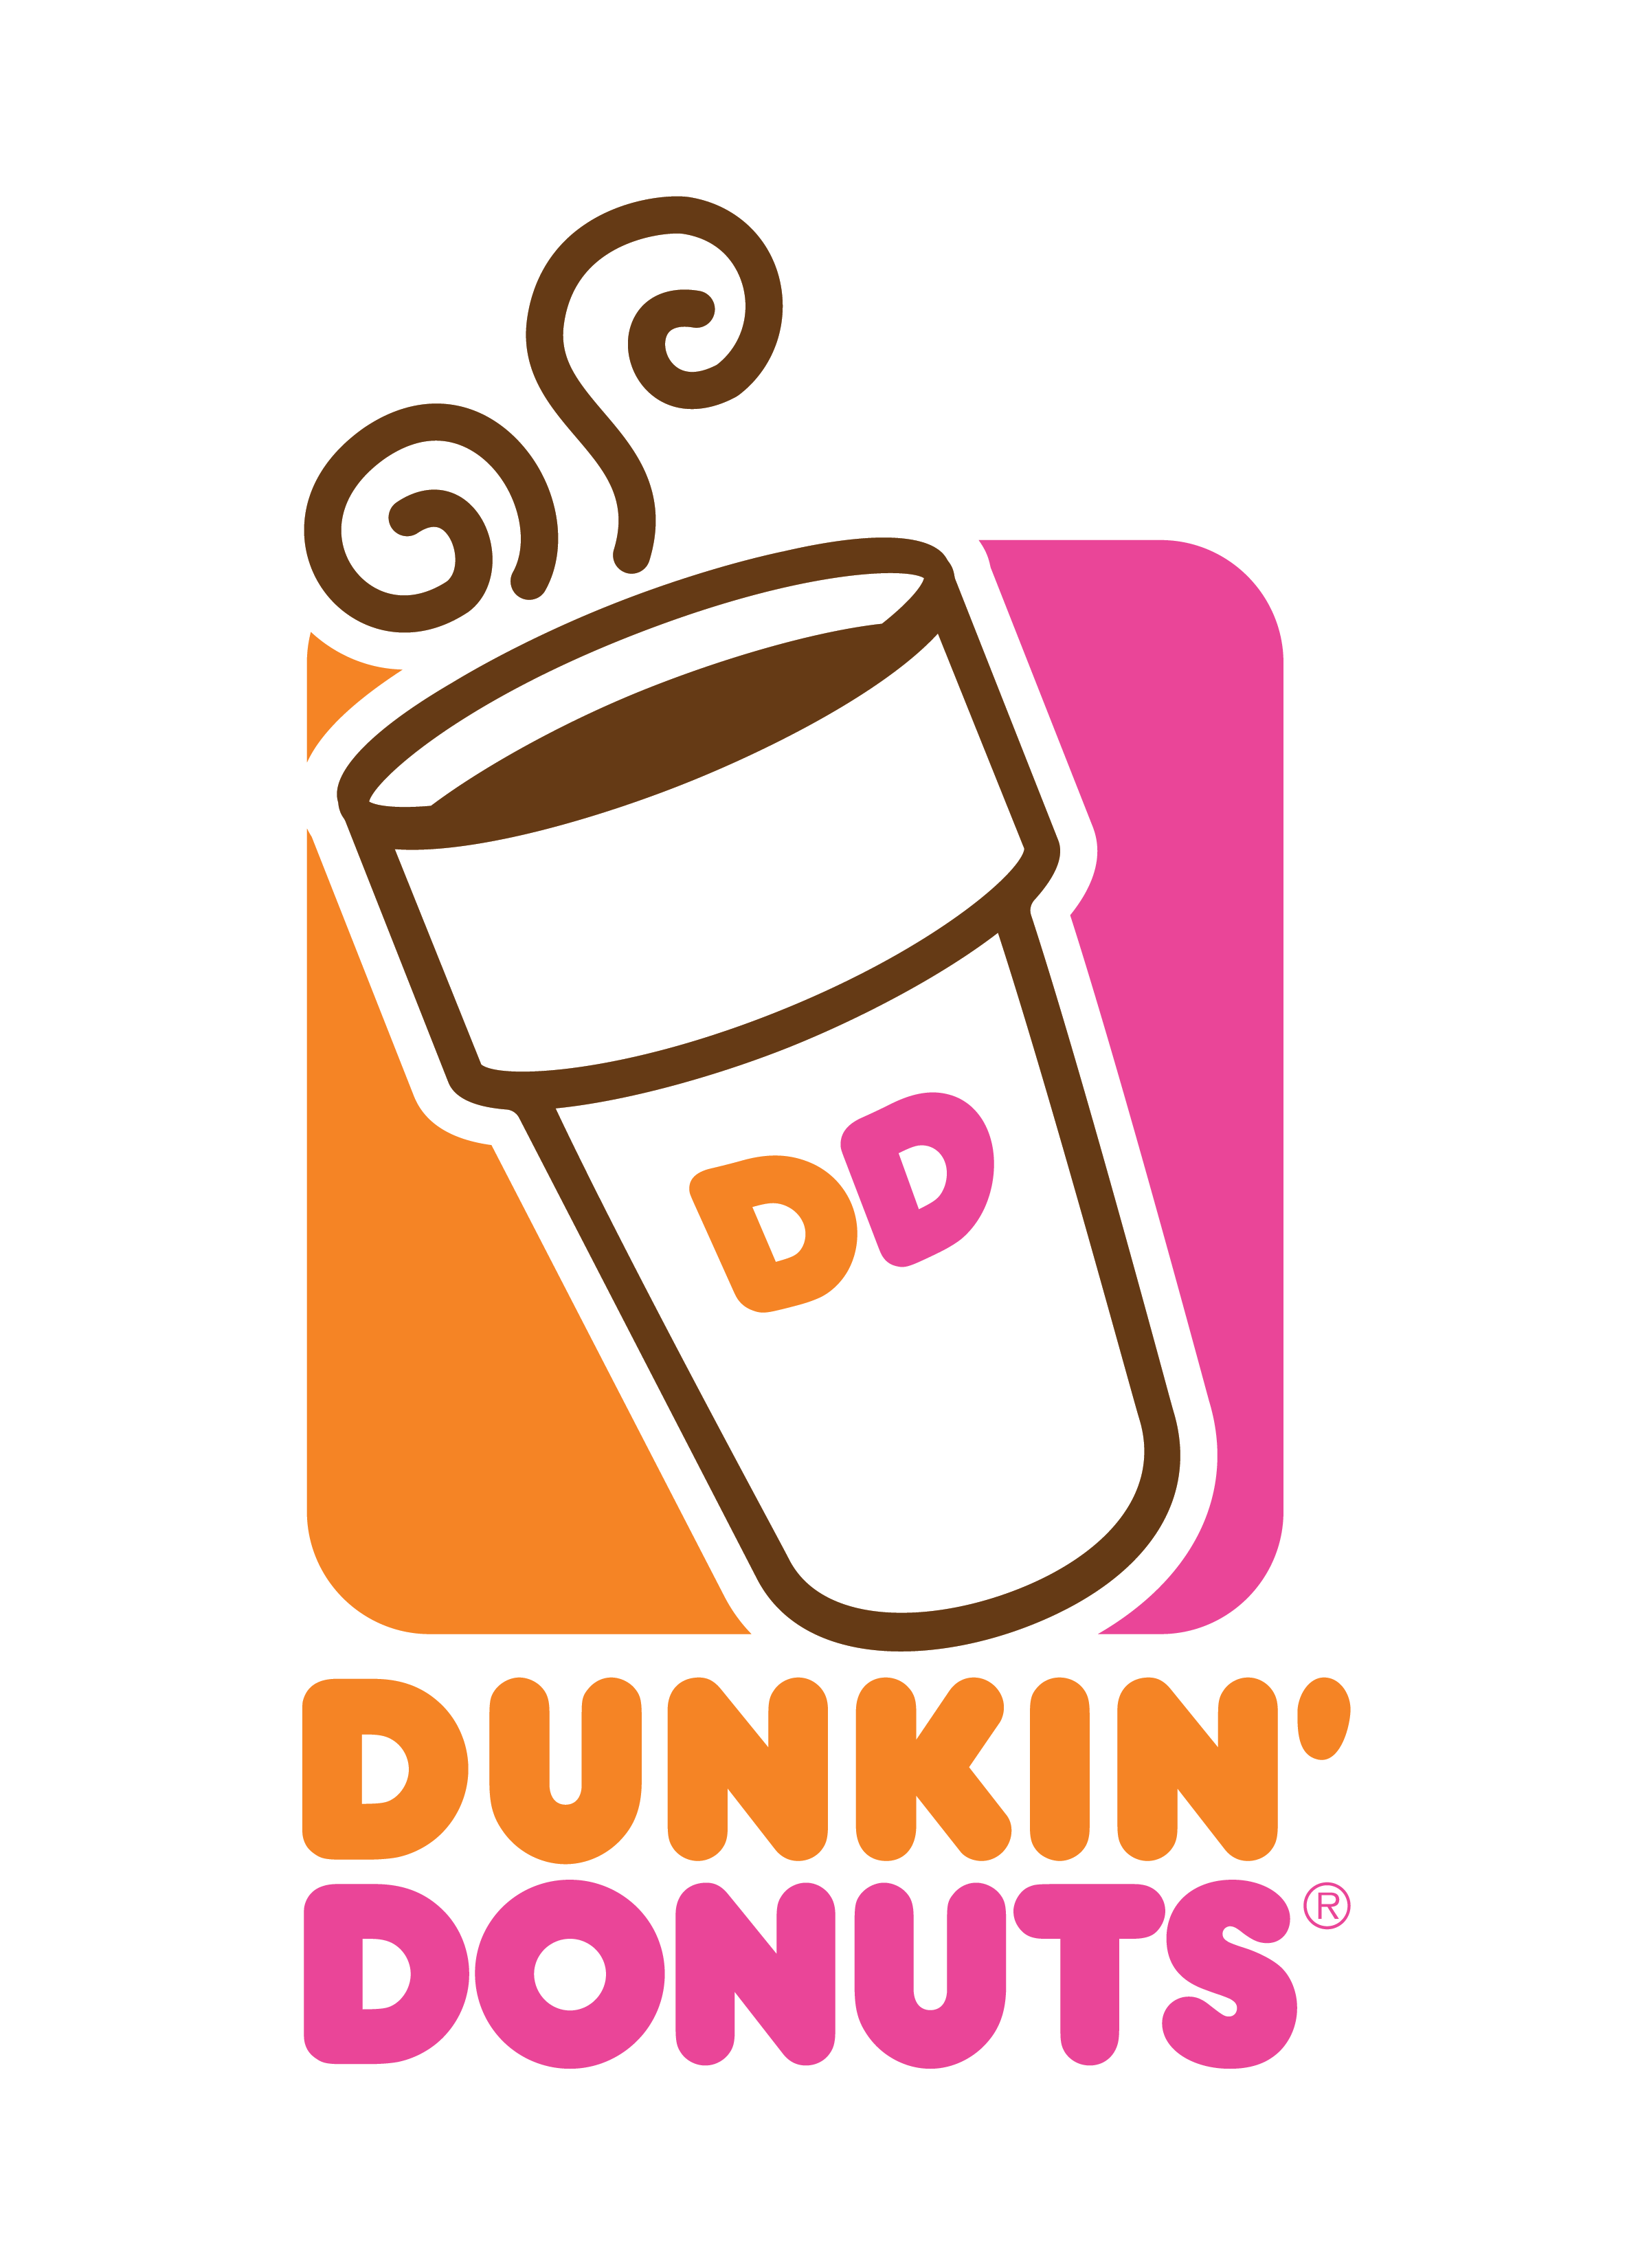 Dunkin Donuts Png Logo Dunkin Donuts Png Logo Donut Logo Dunkin Dunkin Donuts